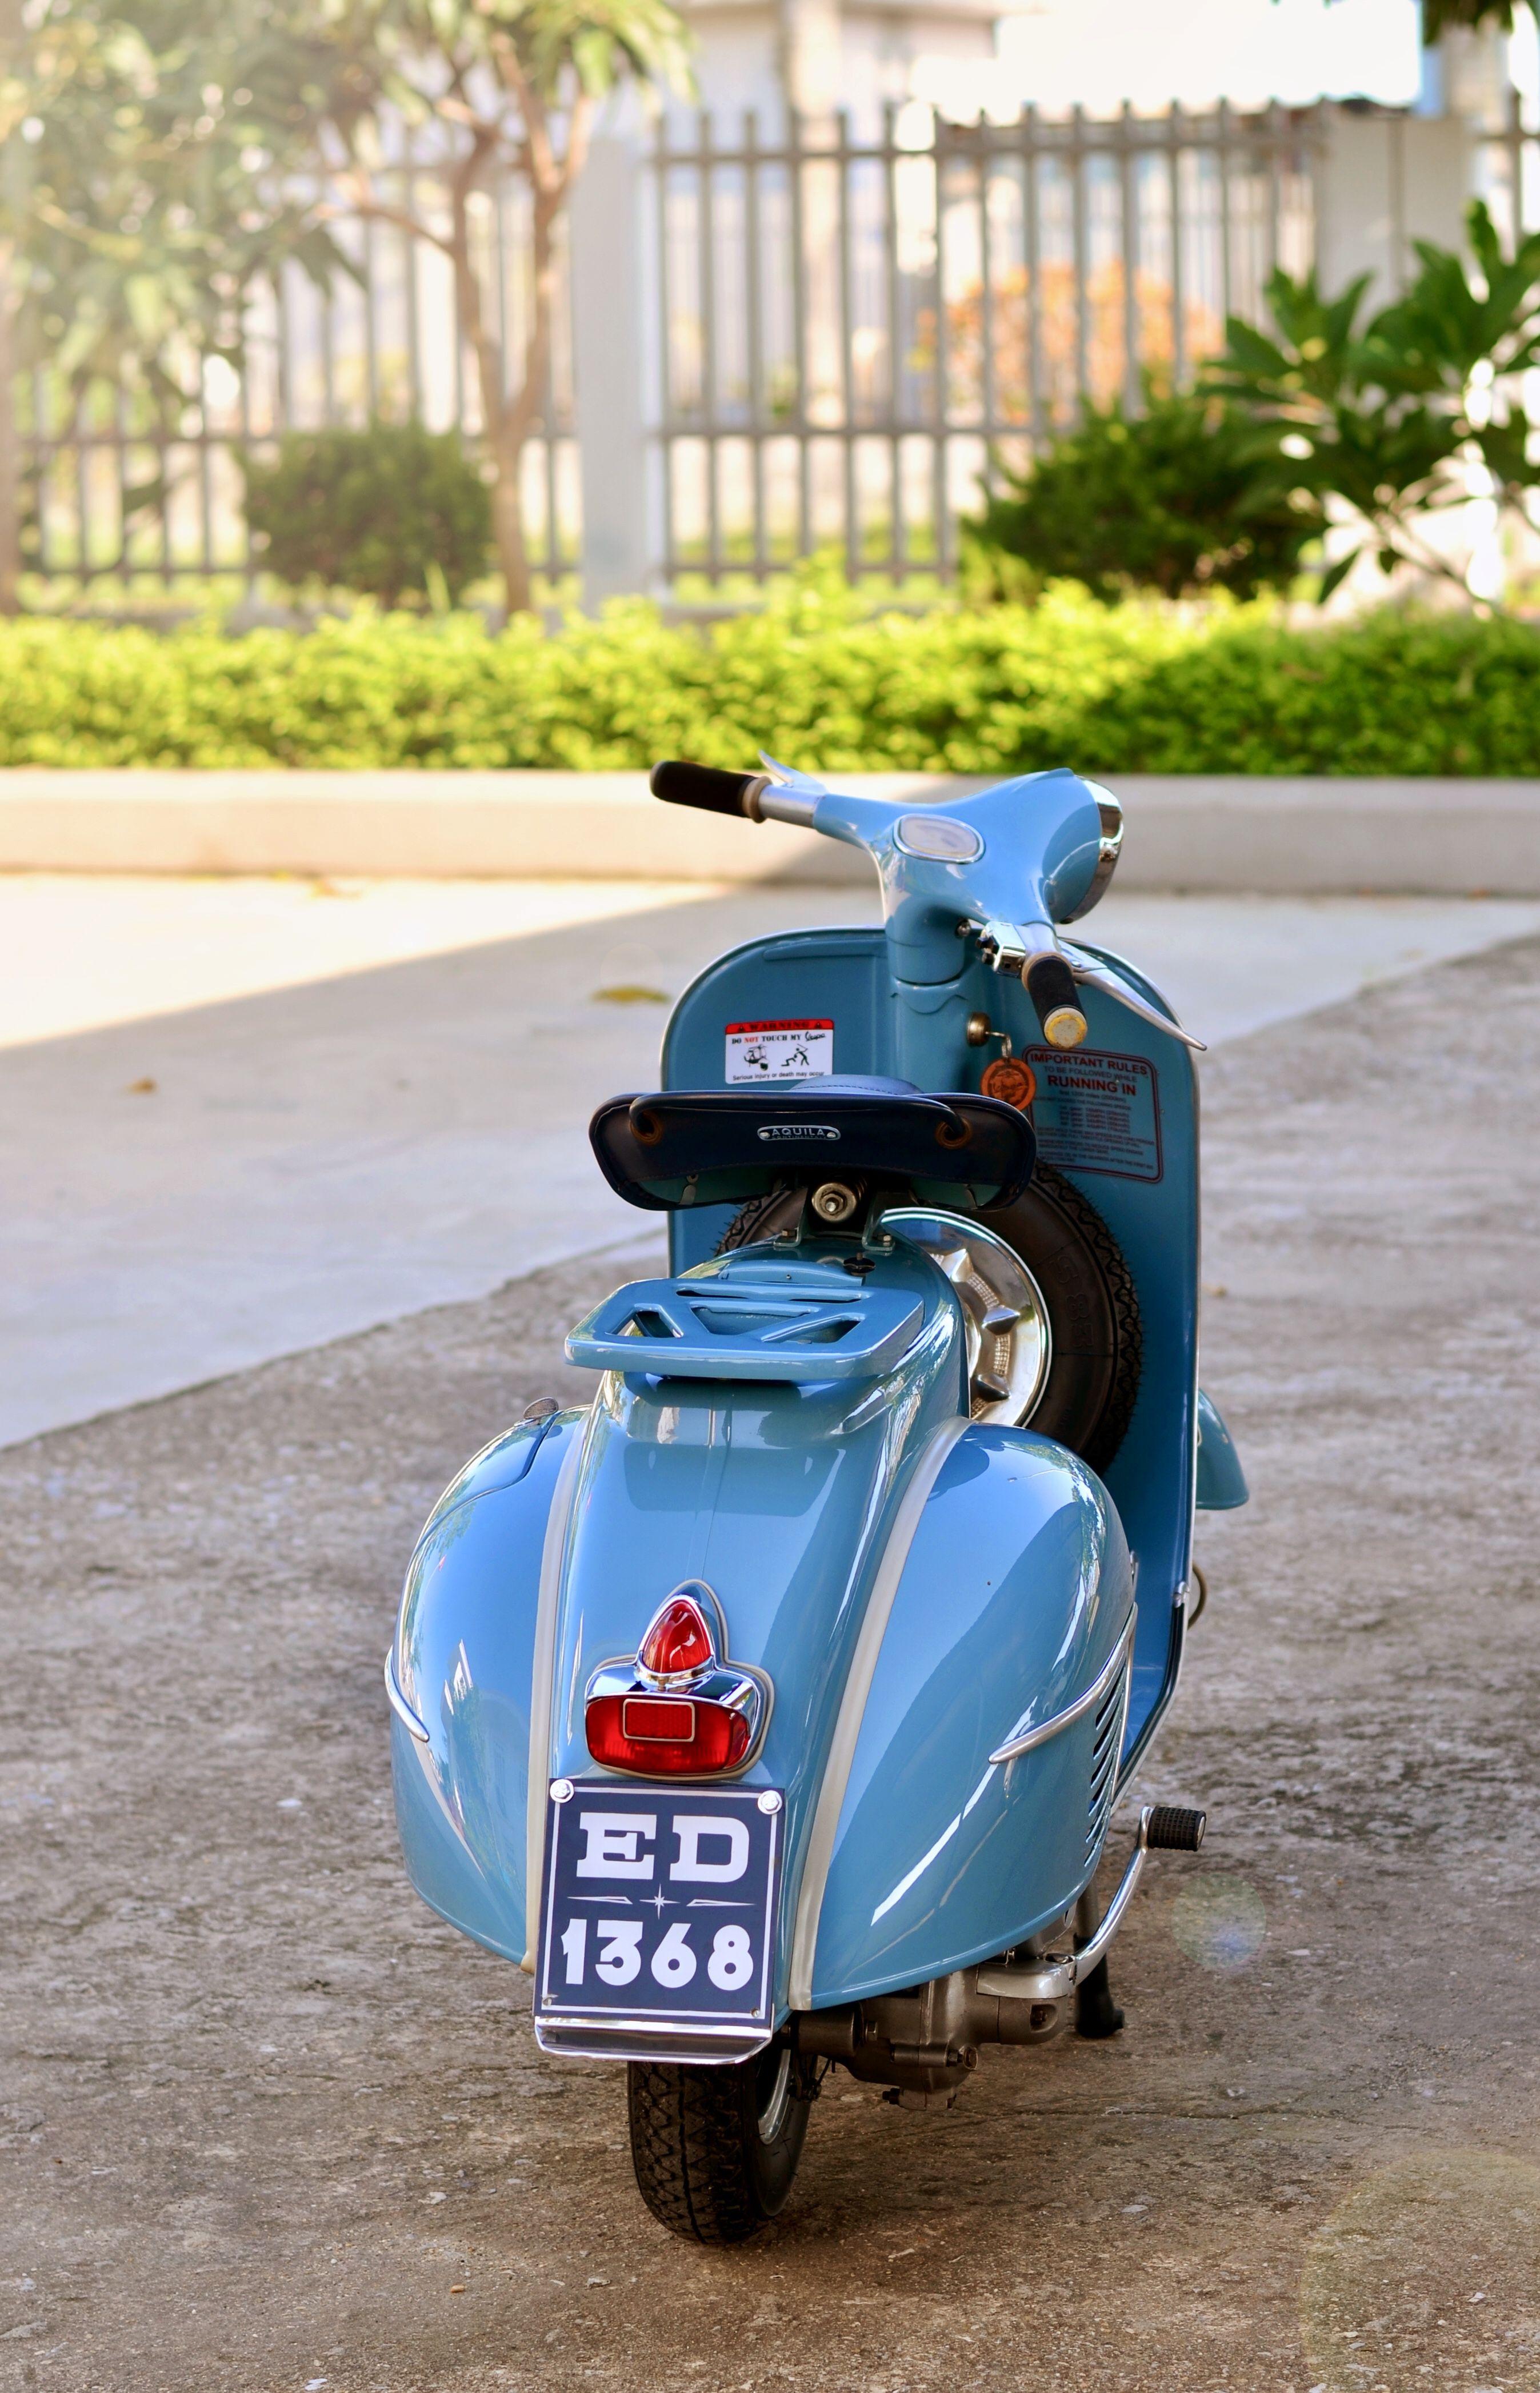 Pin by Vespa Trần on Nhâm HP Vespa, Motorbikes, Motorcycle